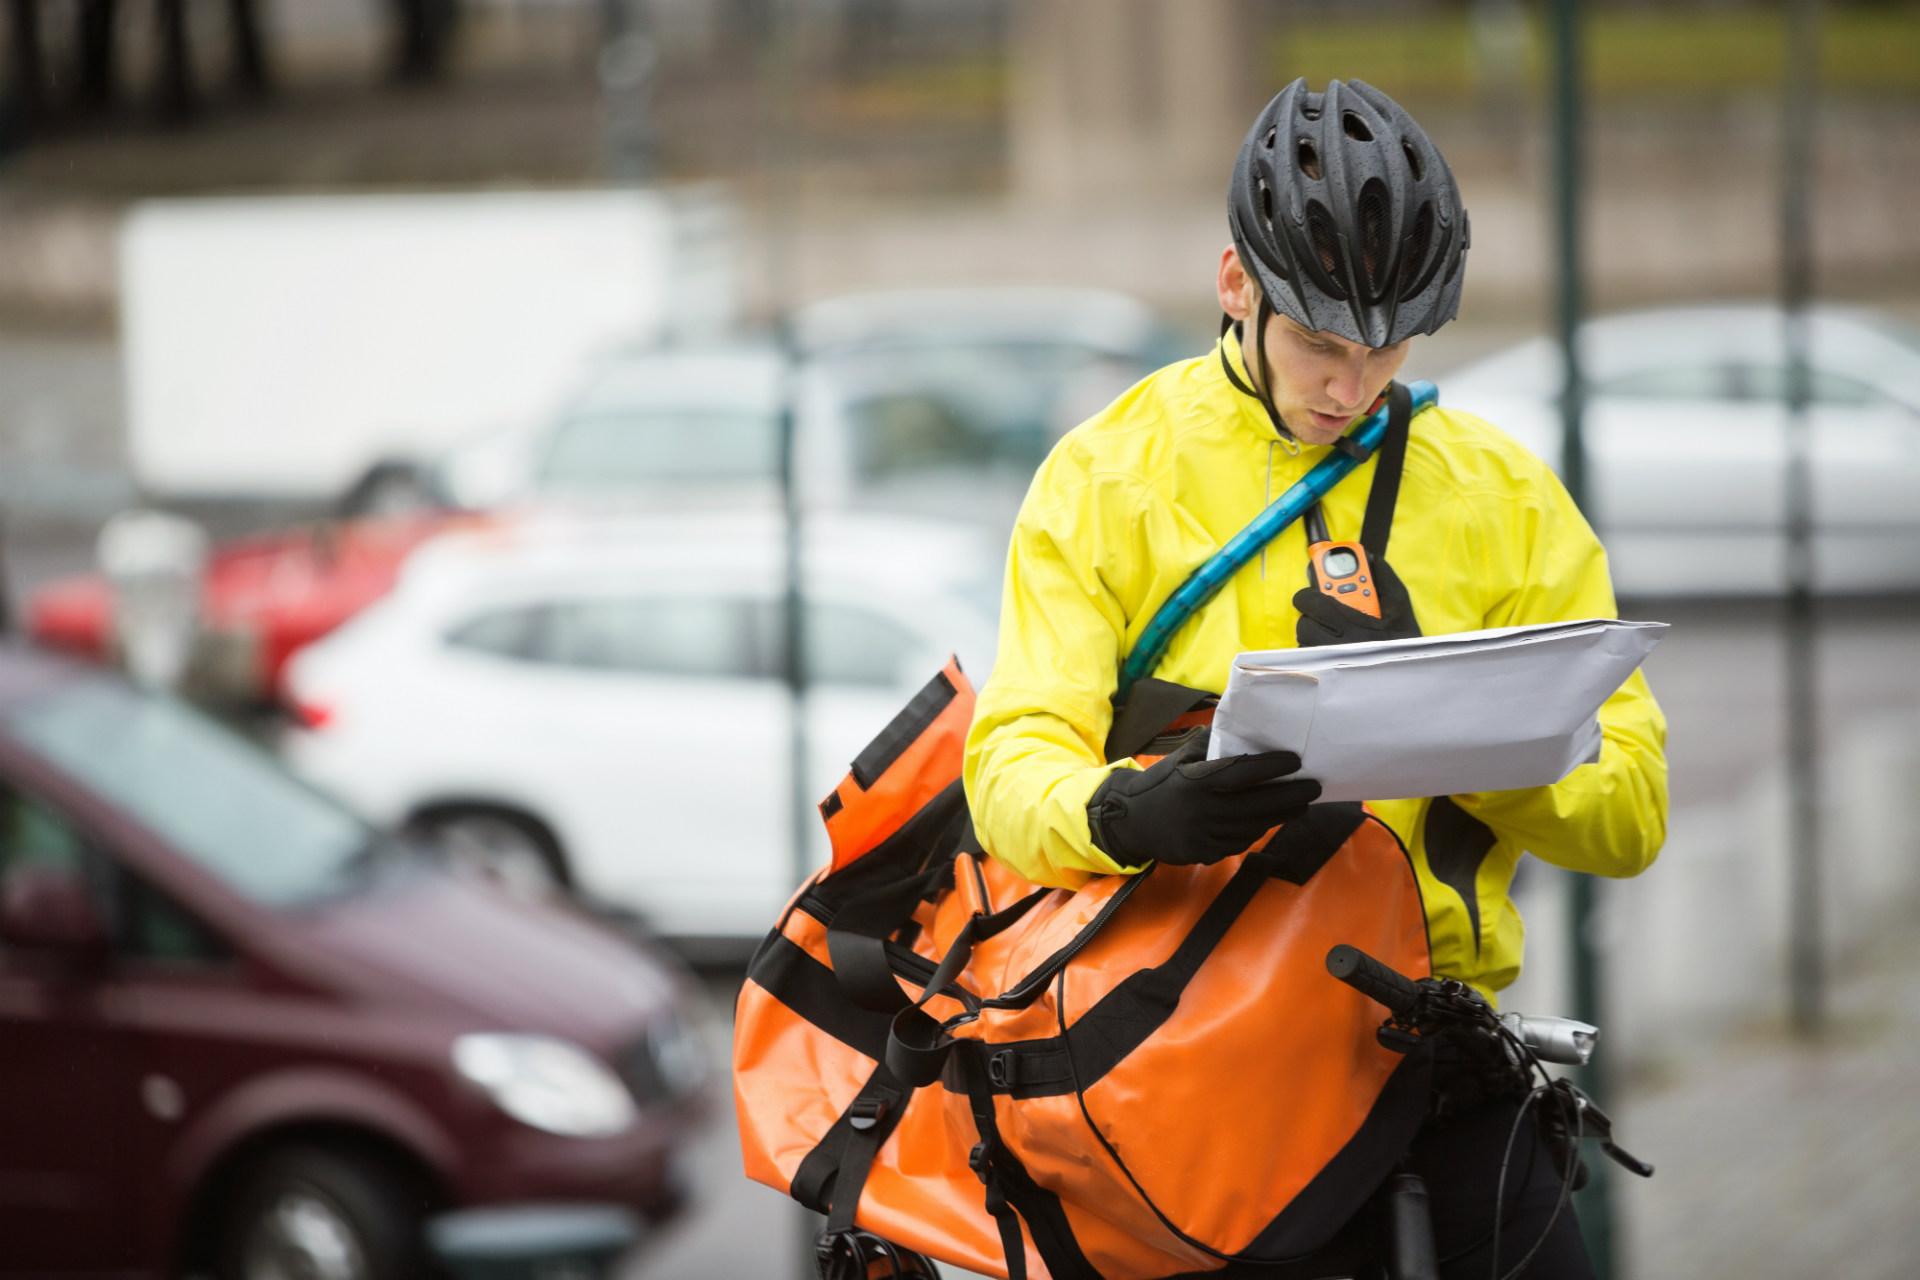 deliveryman on bike looking at parcel